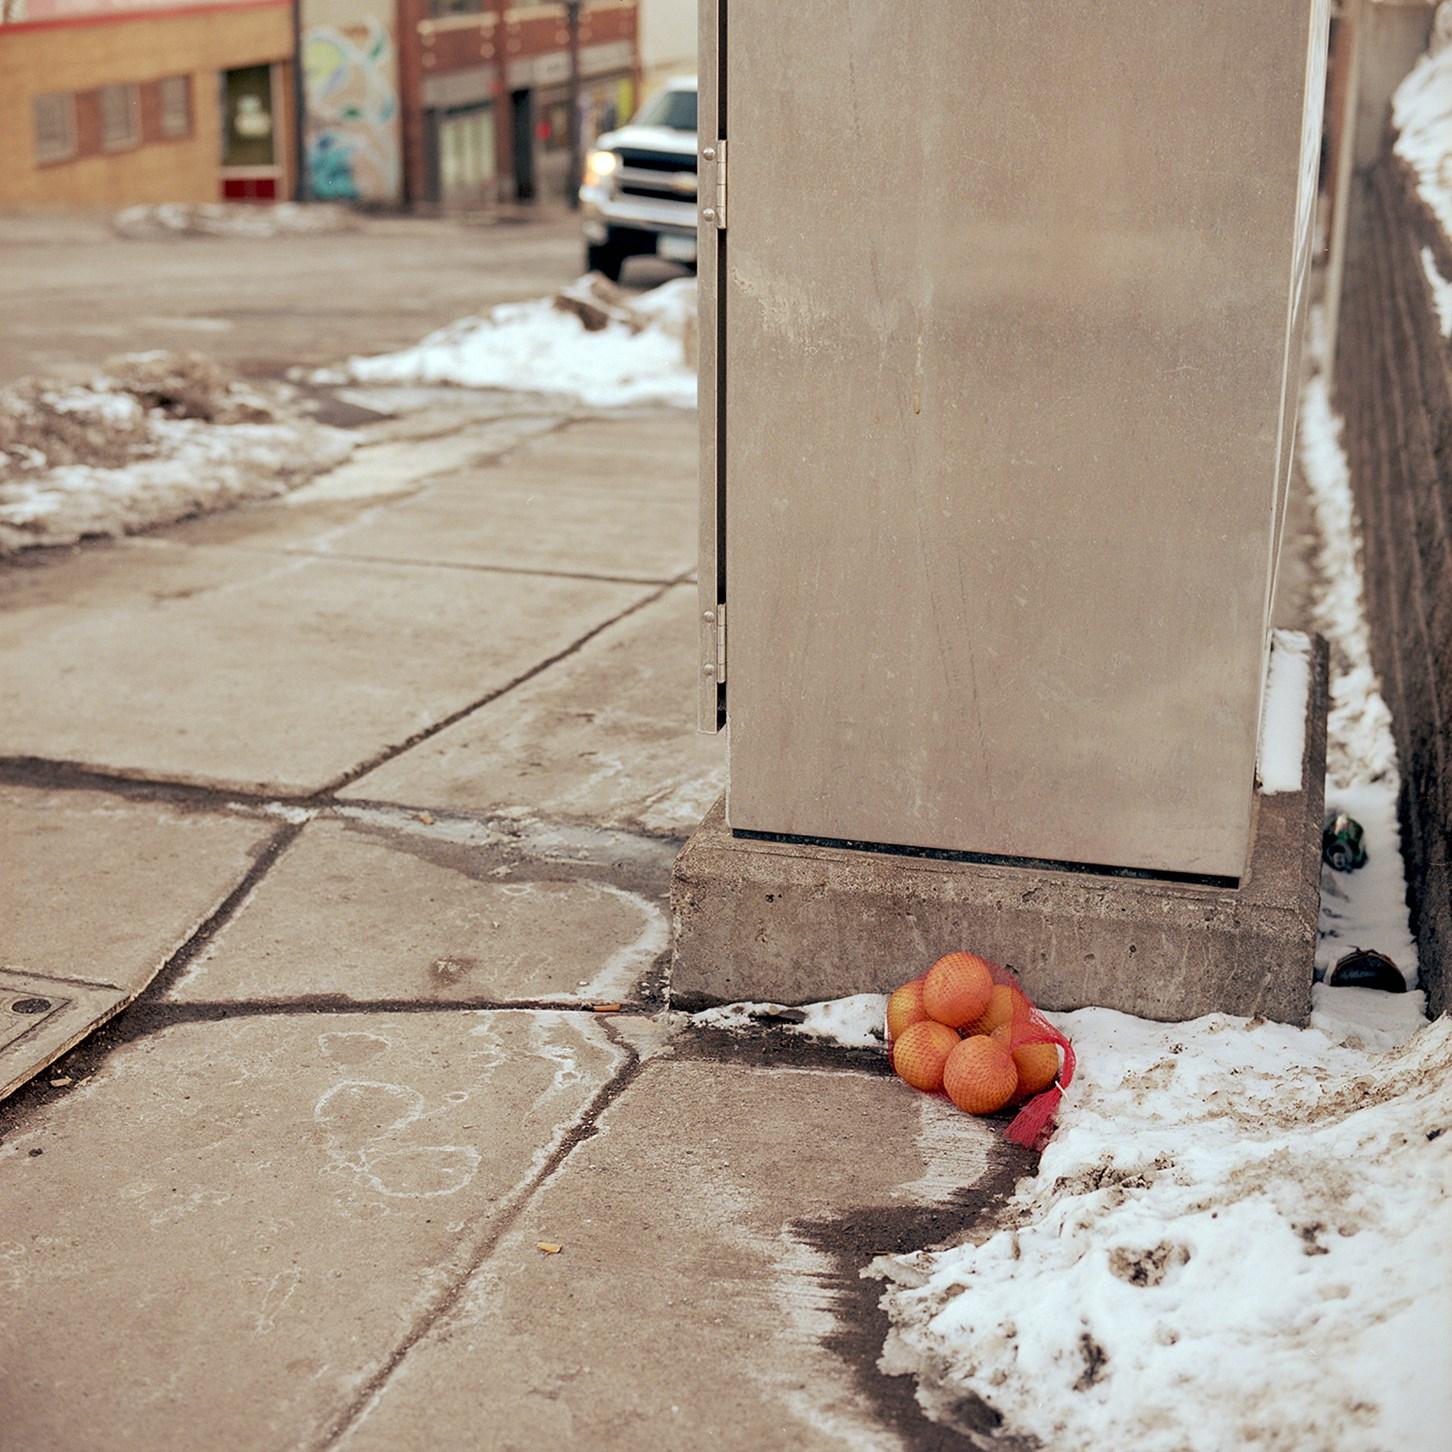 Forgotten Oranges, Duluth, Minnesota, February 2016